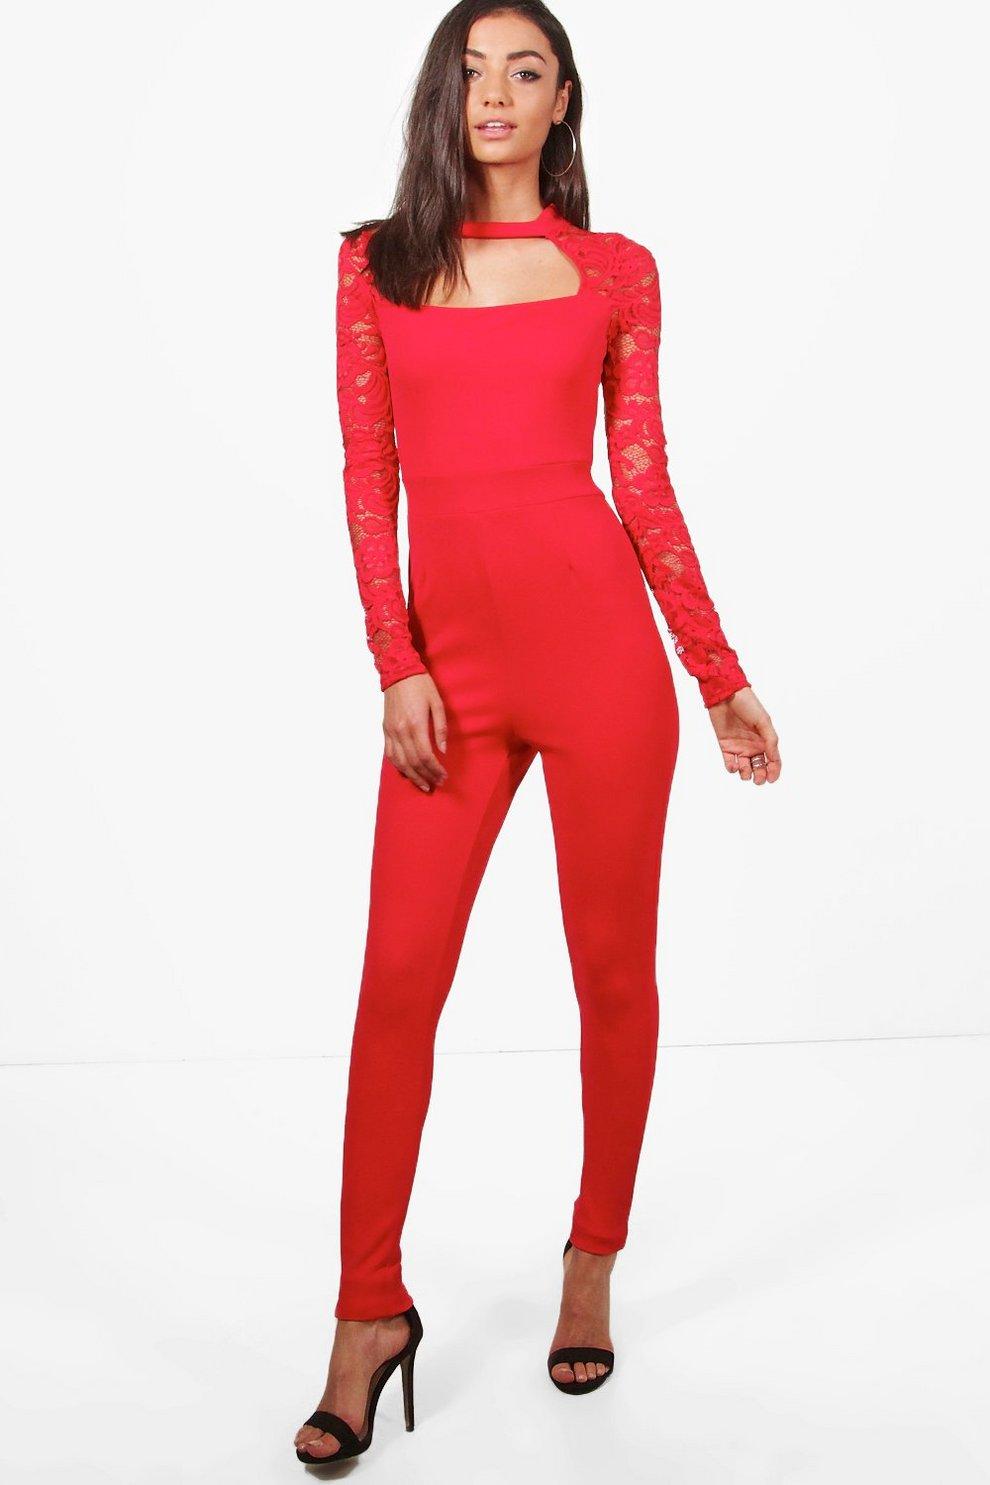 74de85fe2b0a52 Tall Jumpsuit mit Spitze und Cutout, Rot, Weiblich